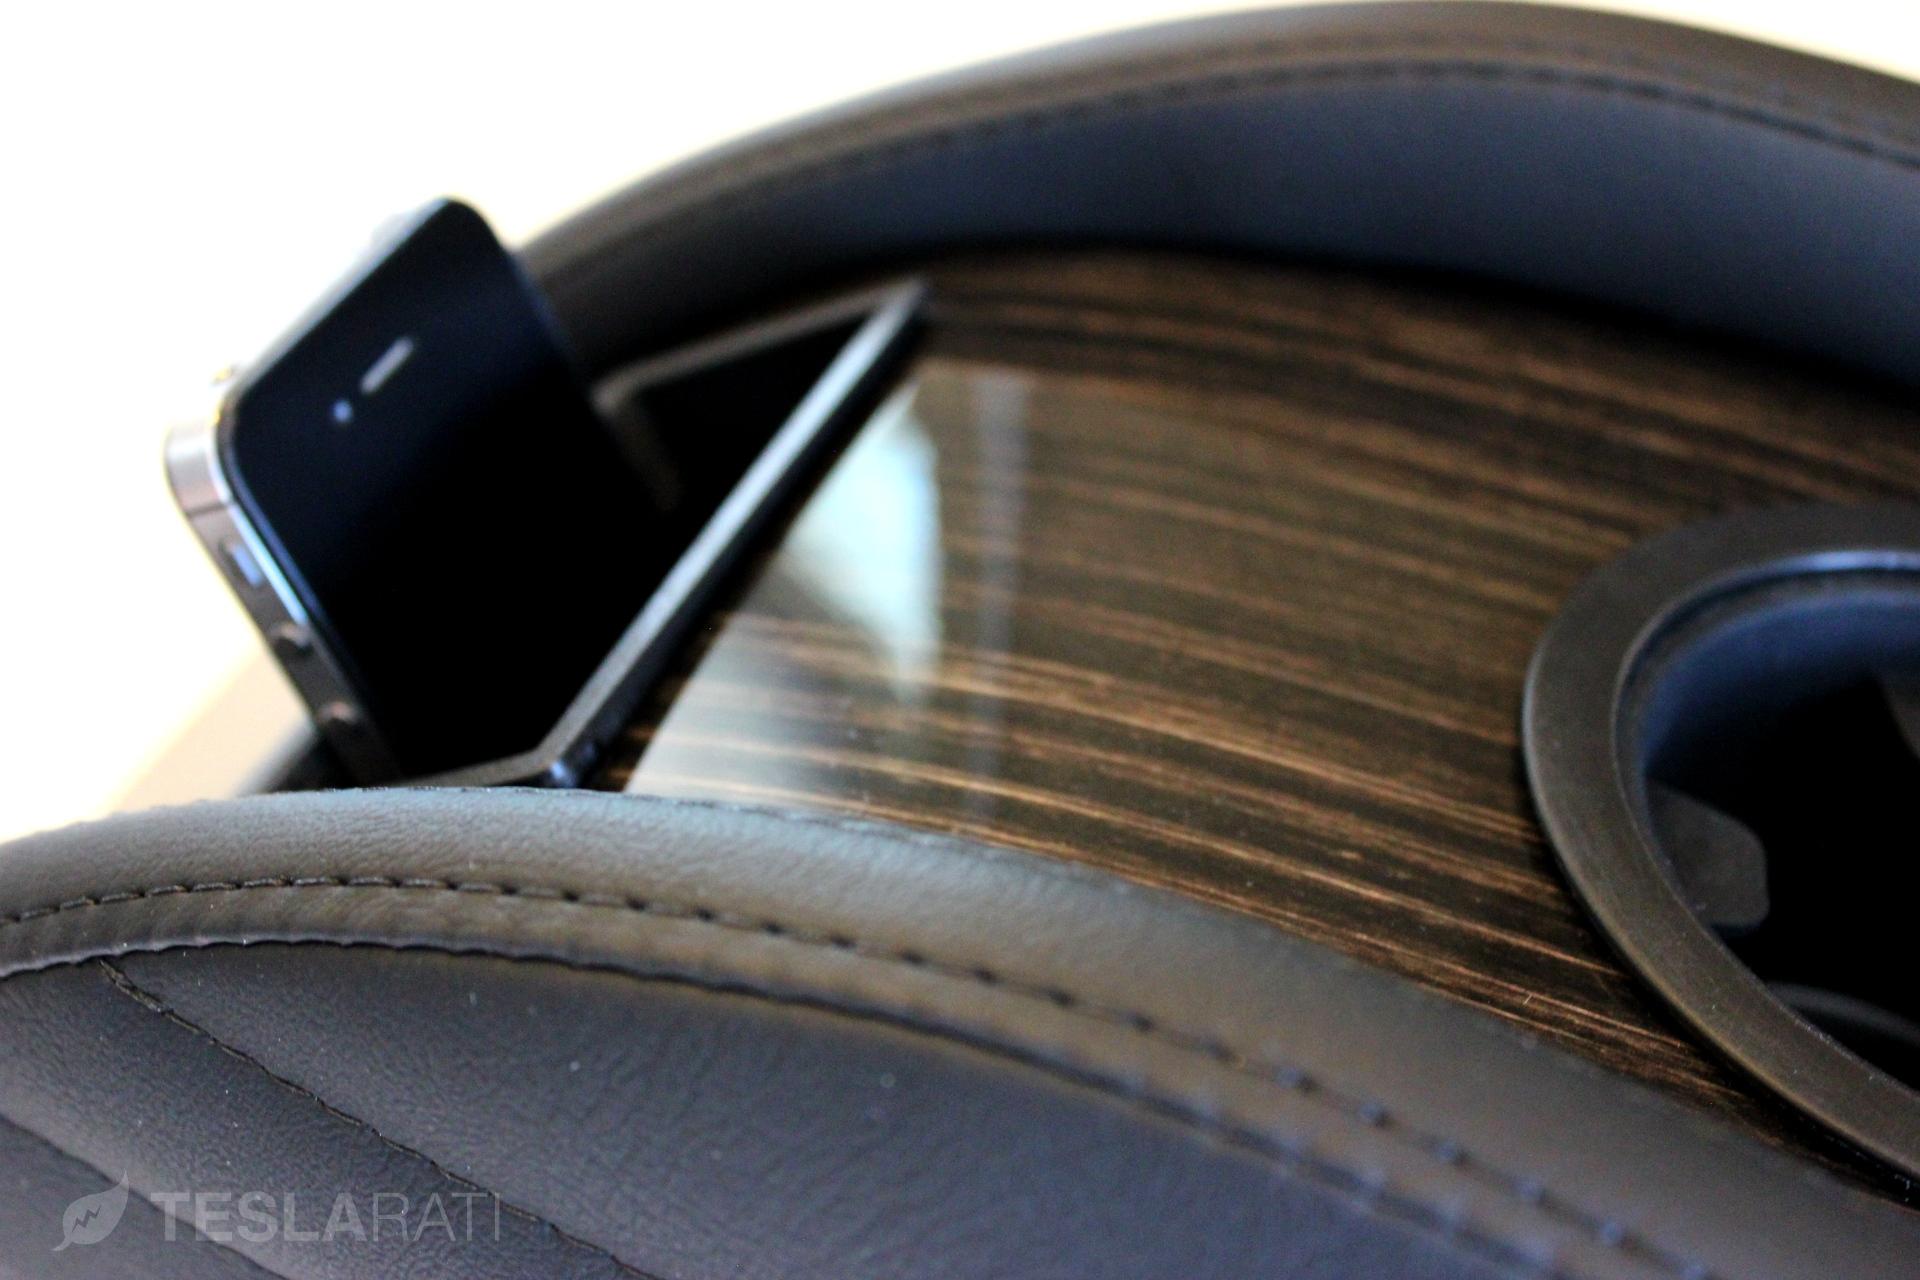 Tesla Model S Center Console Insert (CCI) Phone Caddy